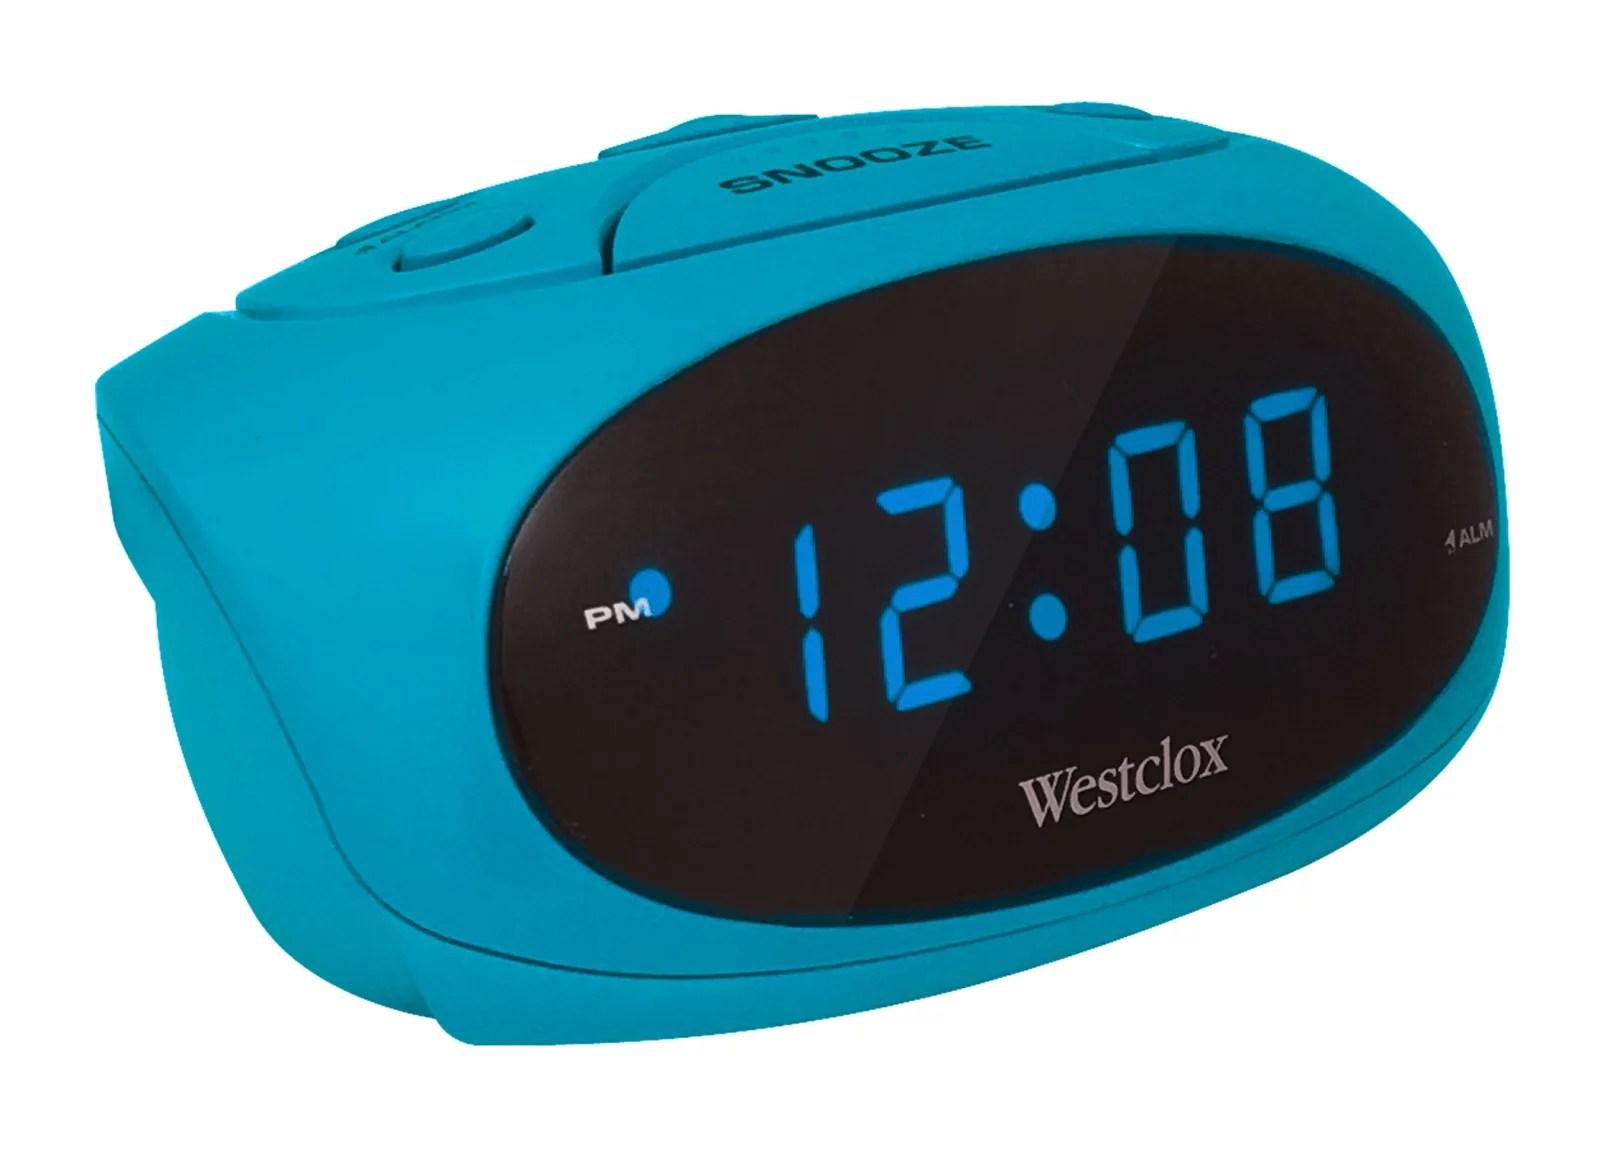 Westclox 70044a Super-loud Led Electric Alarm Clock black